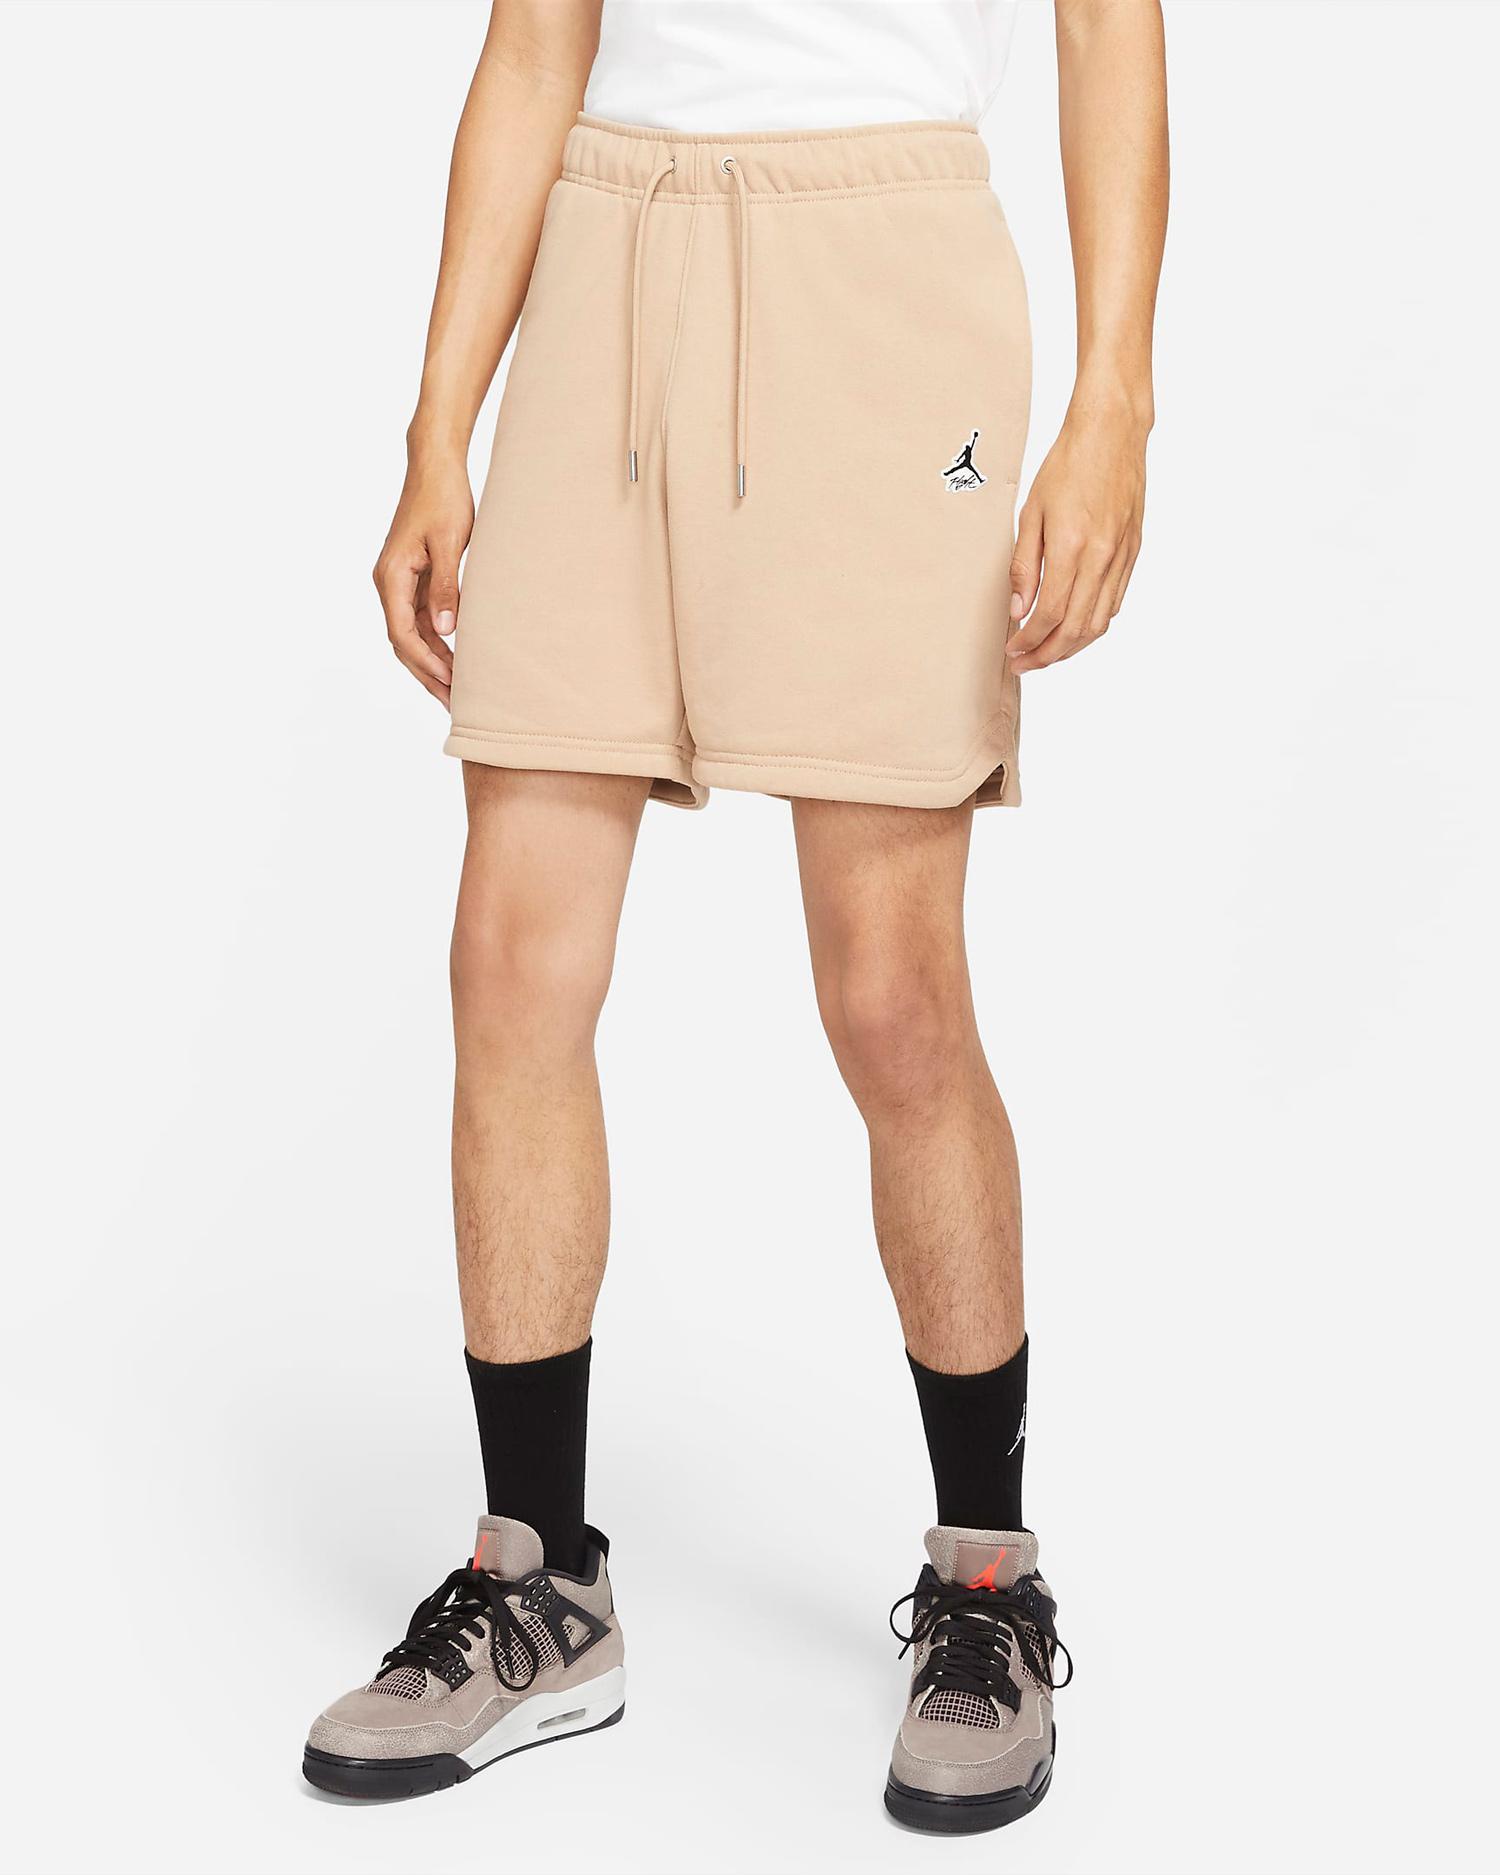 jordan-hemp-essentials-fleece-shorts-1